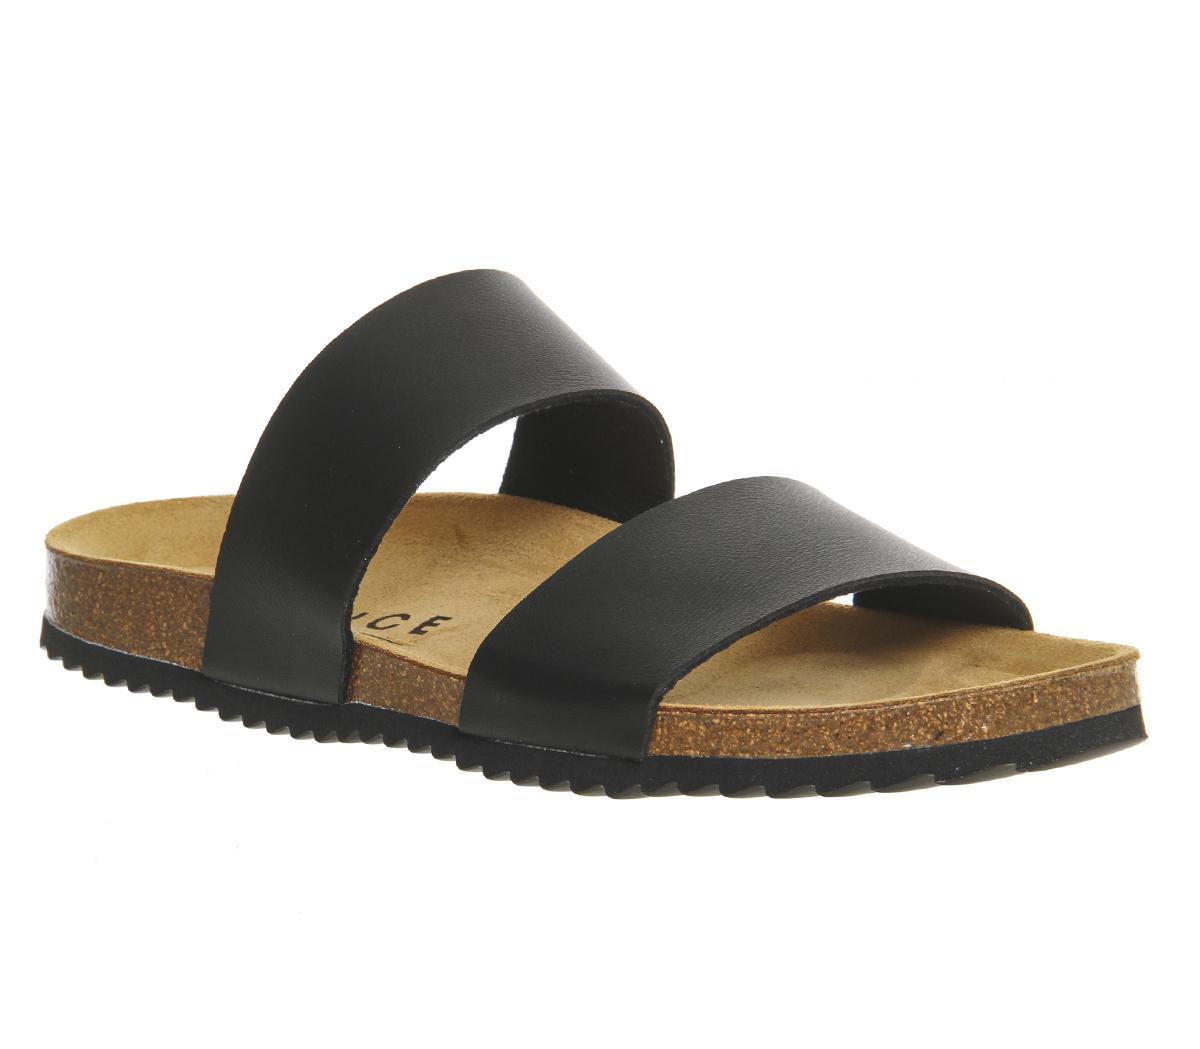 Oslo 2 Sandals